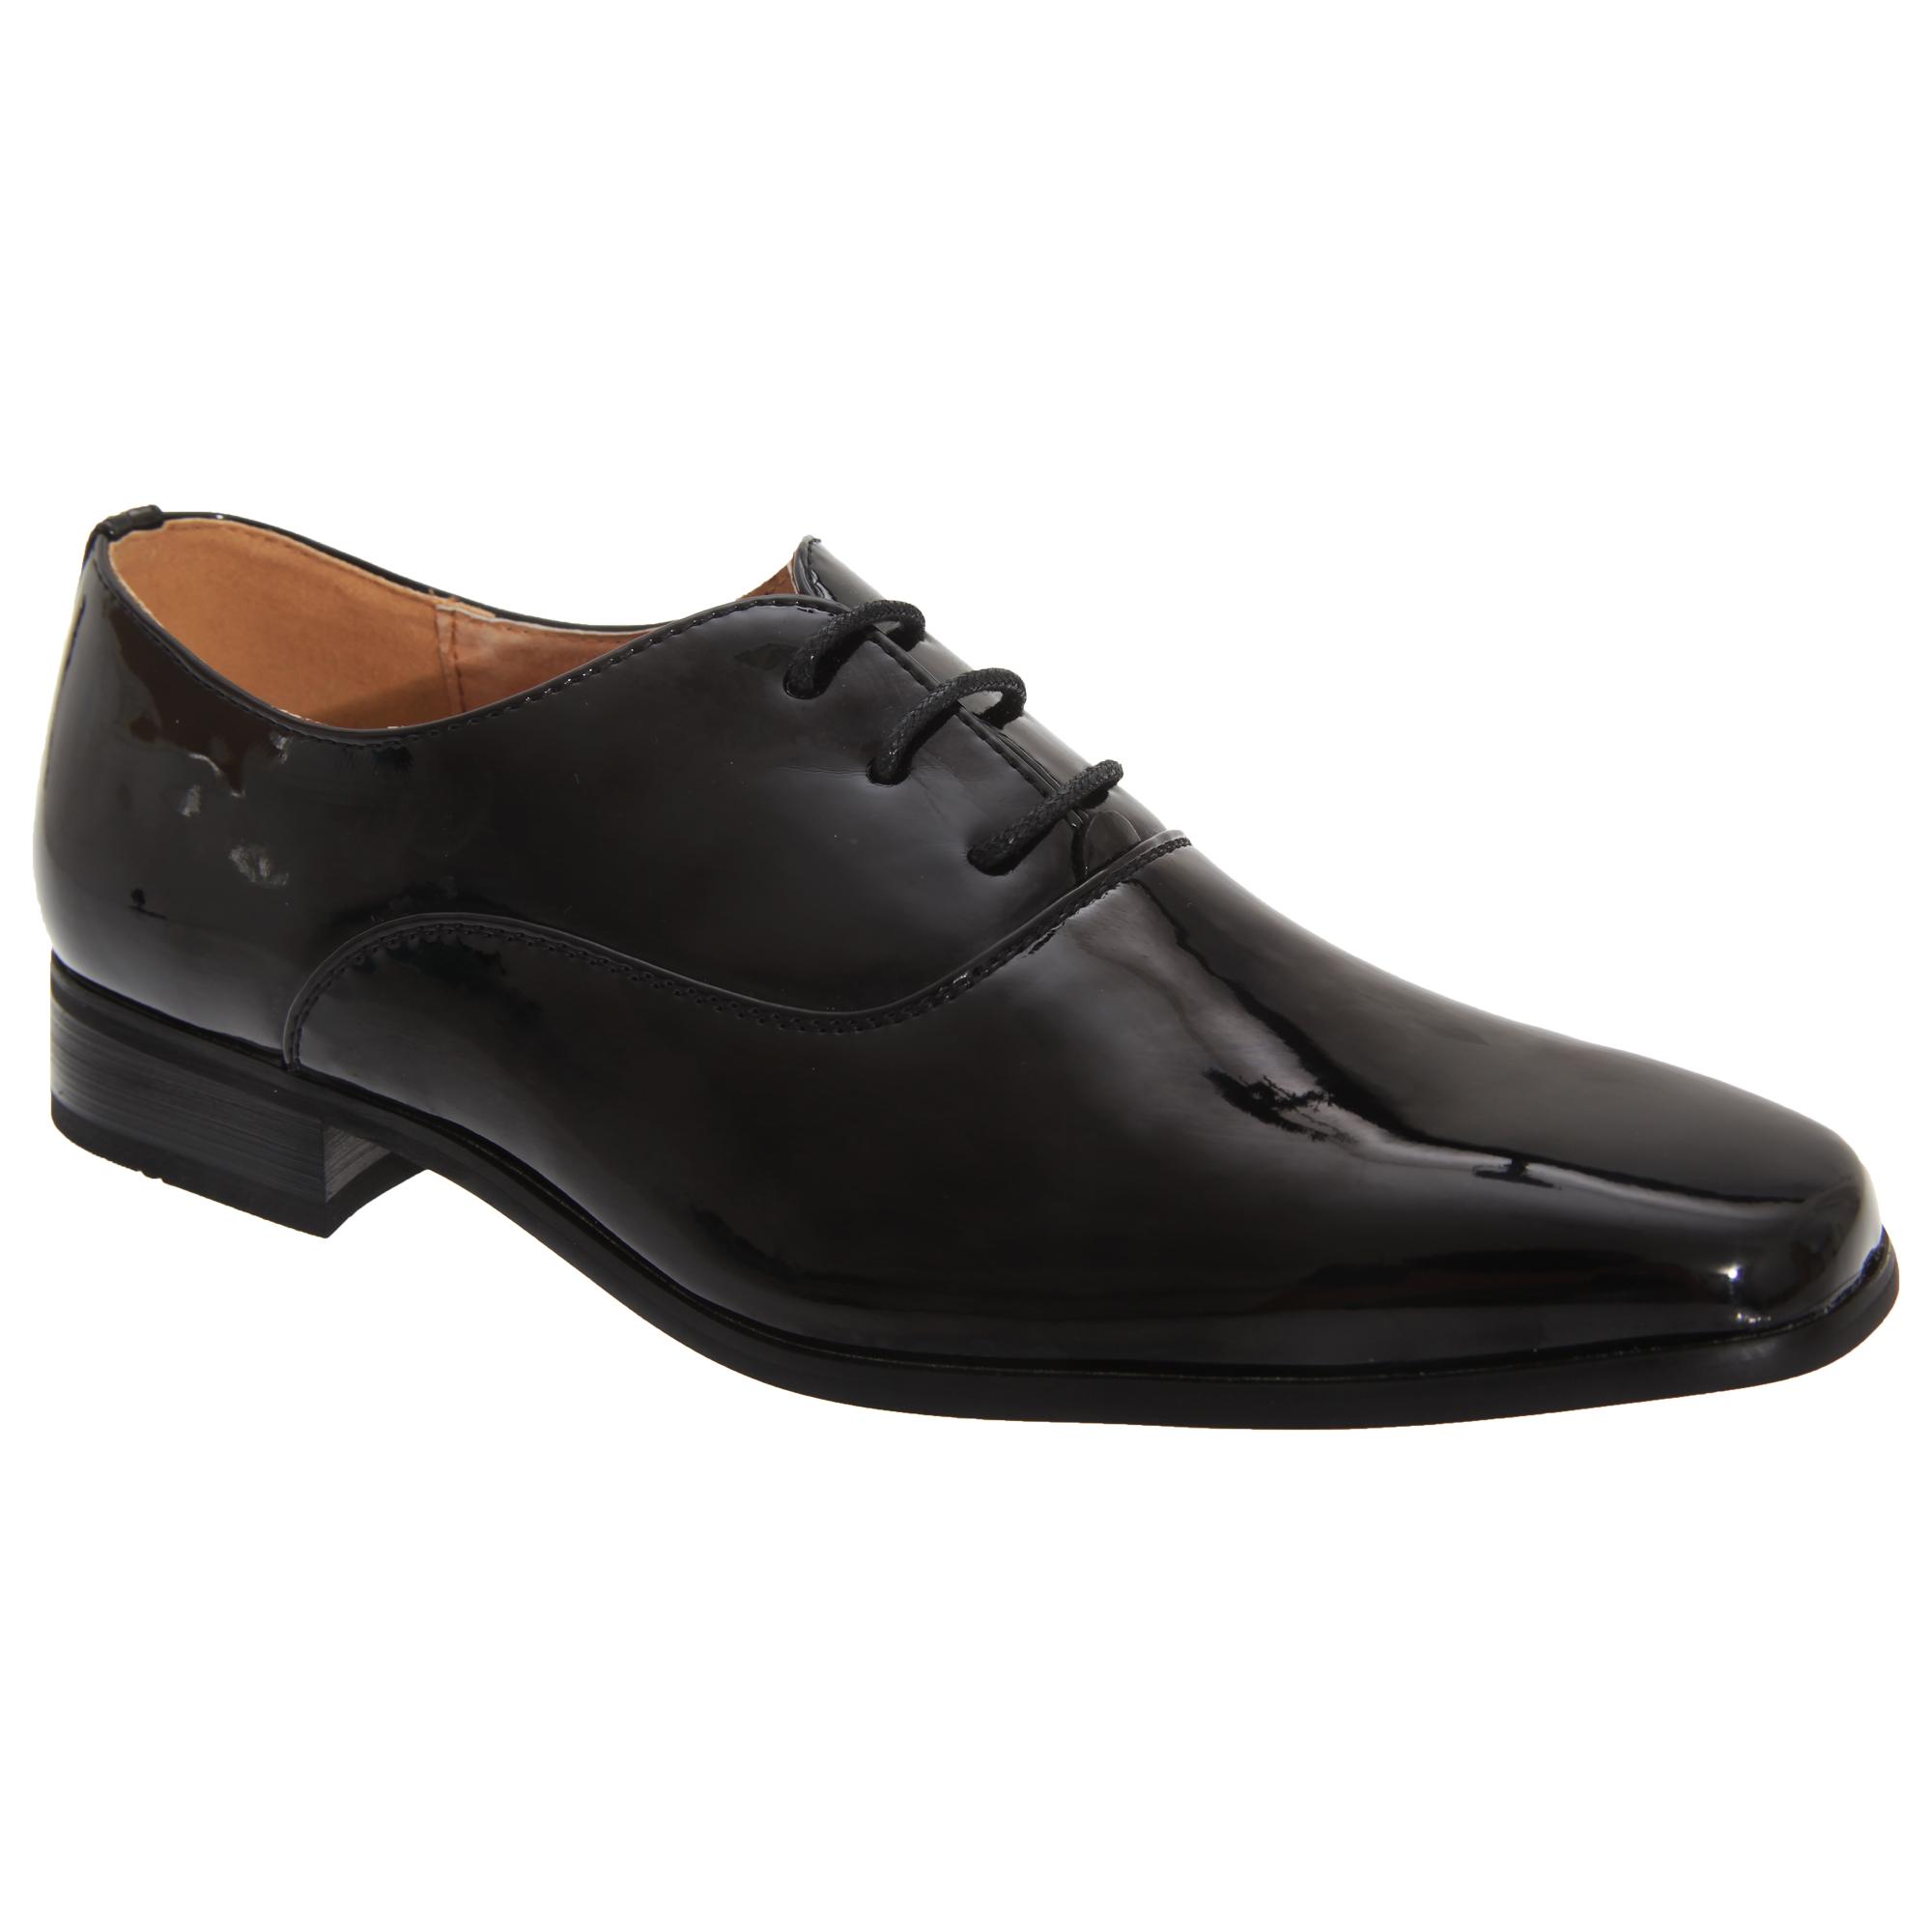 Goor Older Boys Patent Leather Lace-Up Oxford Tie Dress Shoes (4 UK) (Black Patent)